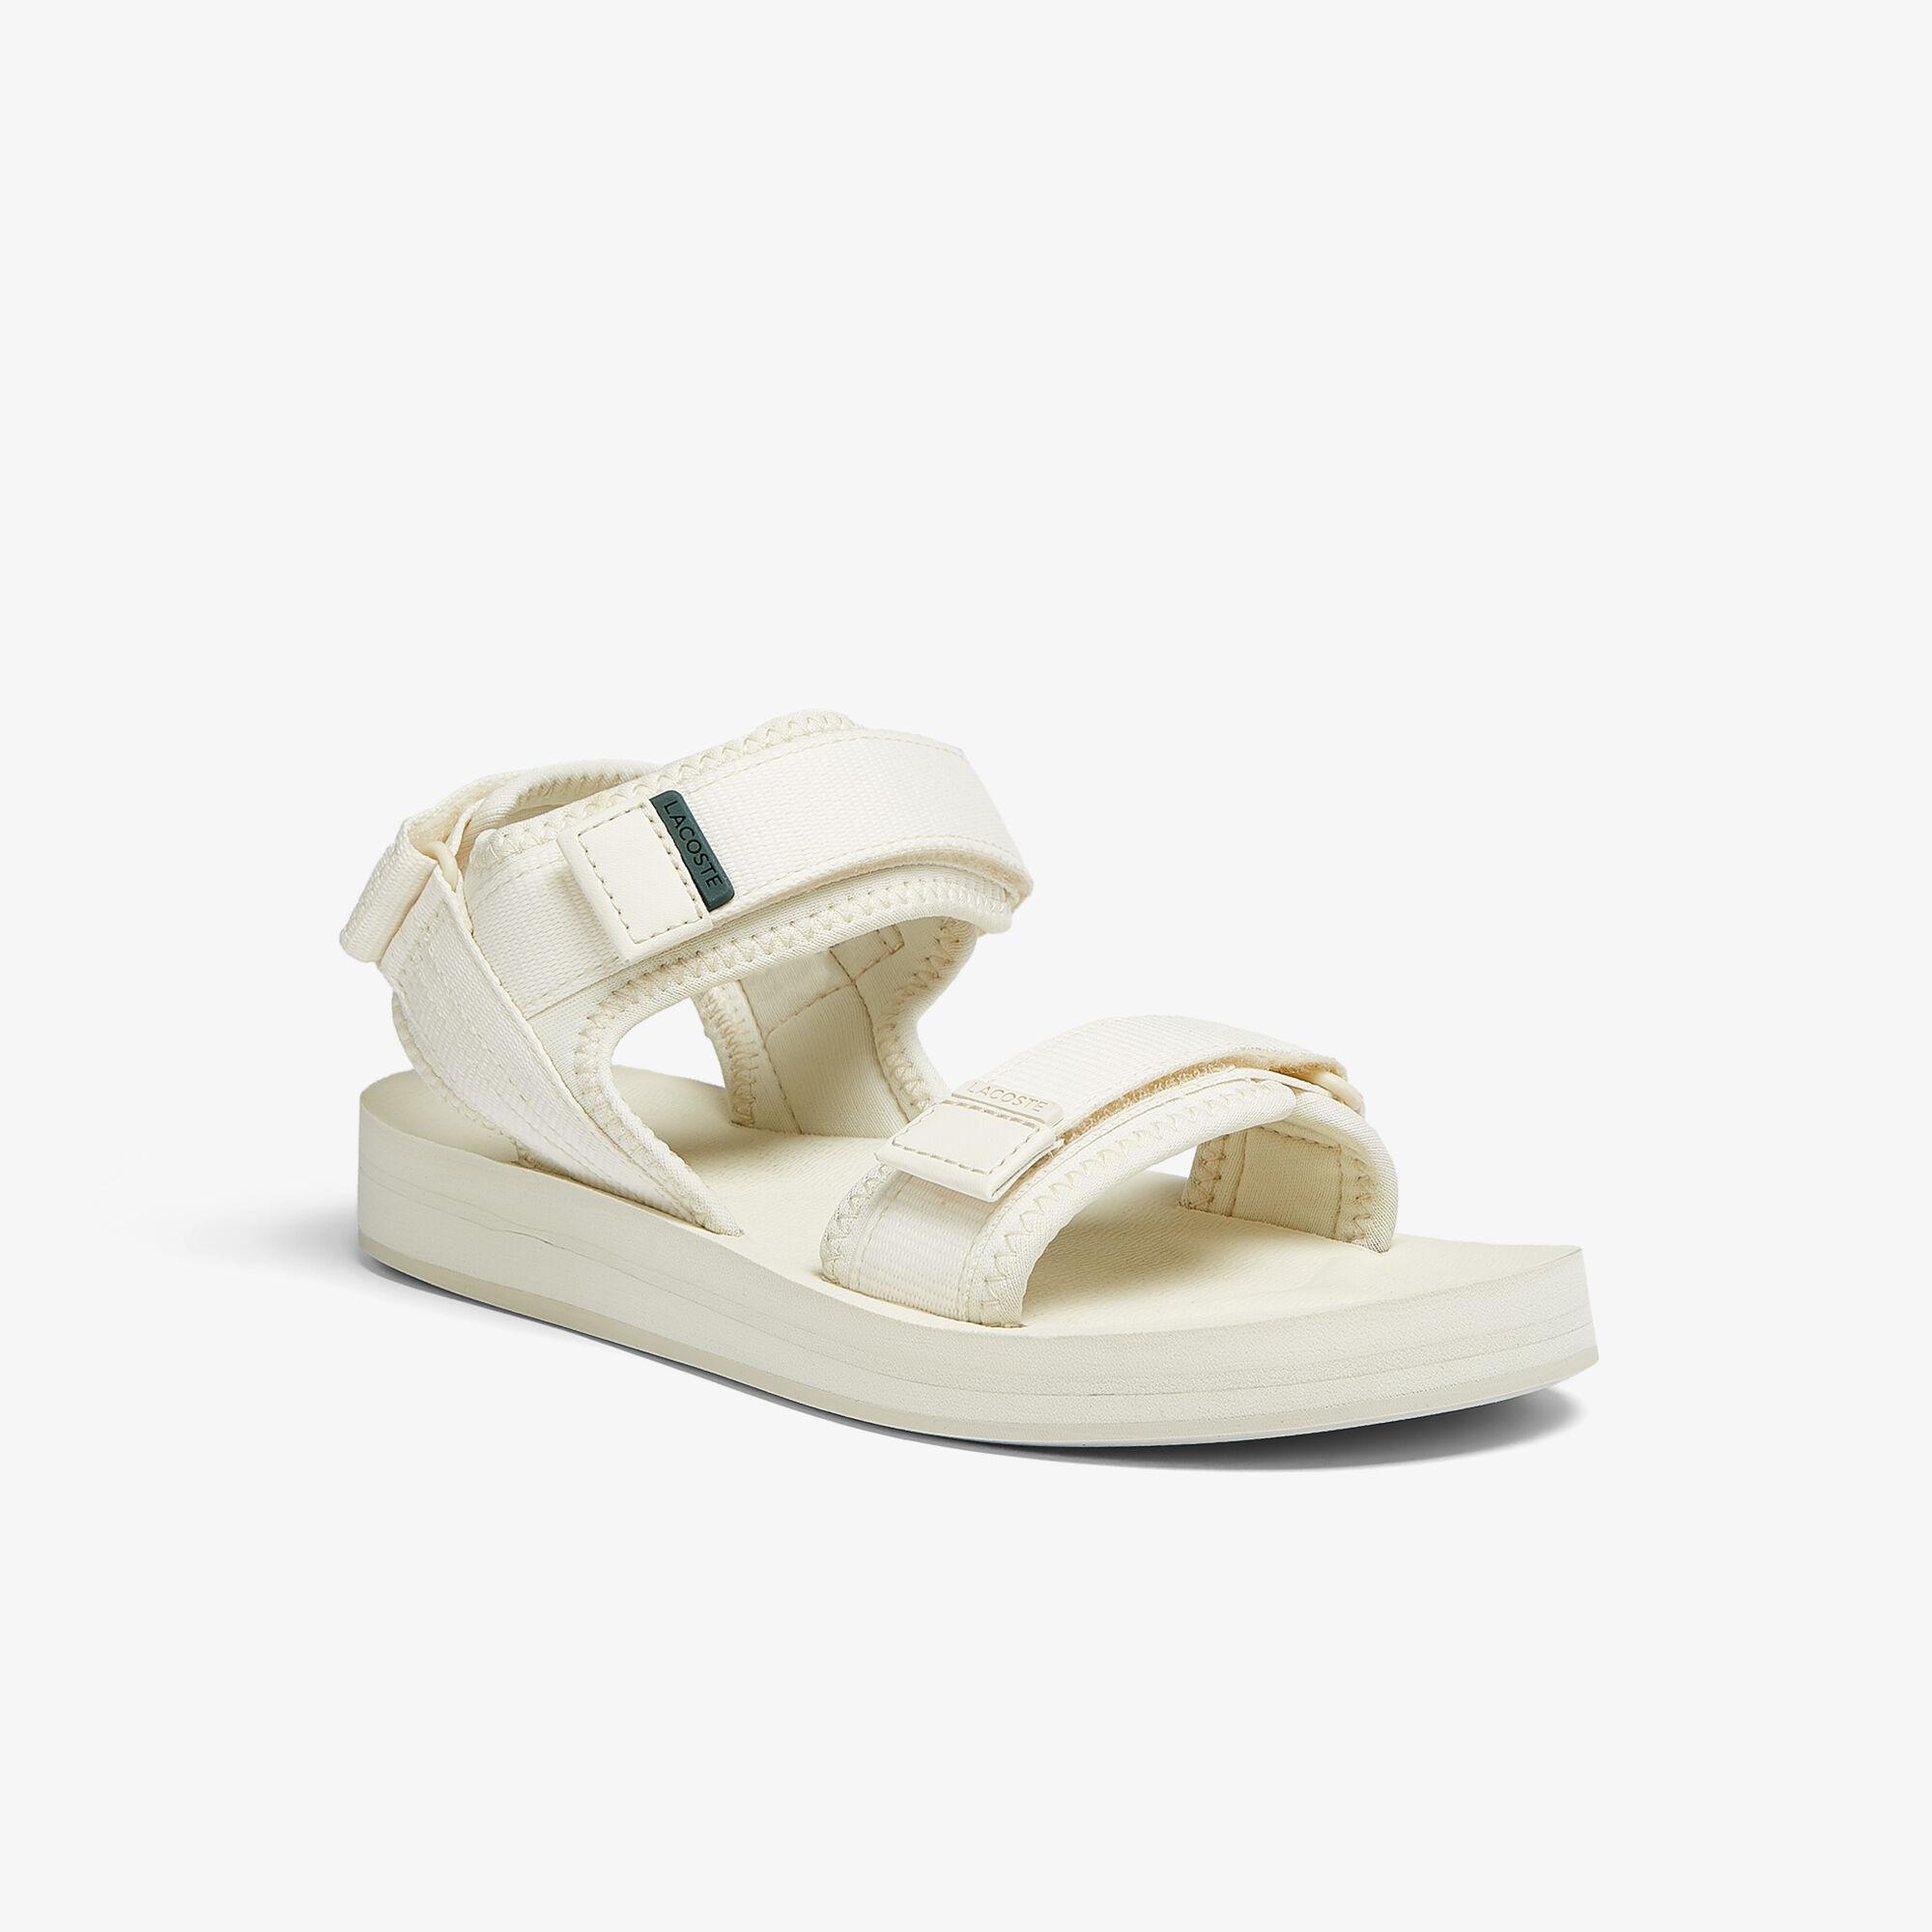 Women's Suruga Tonal Textile Sandals